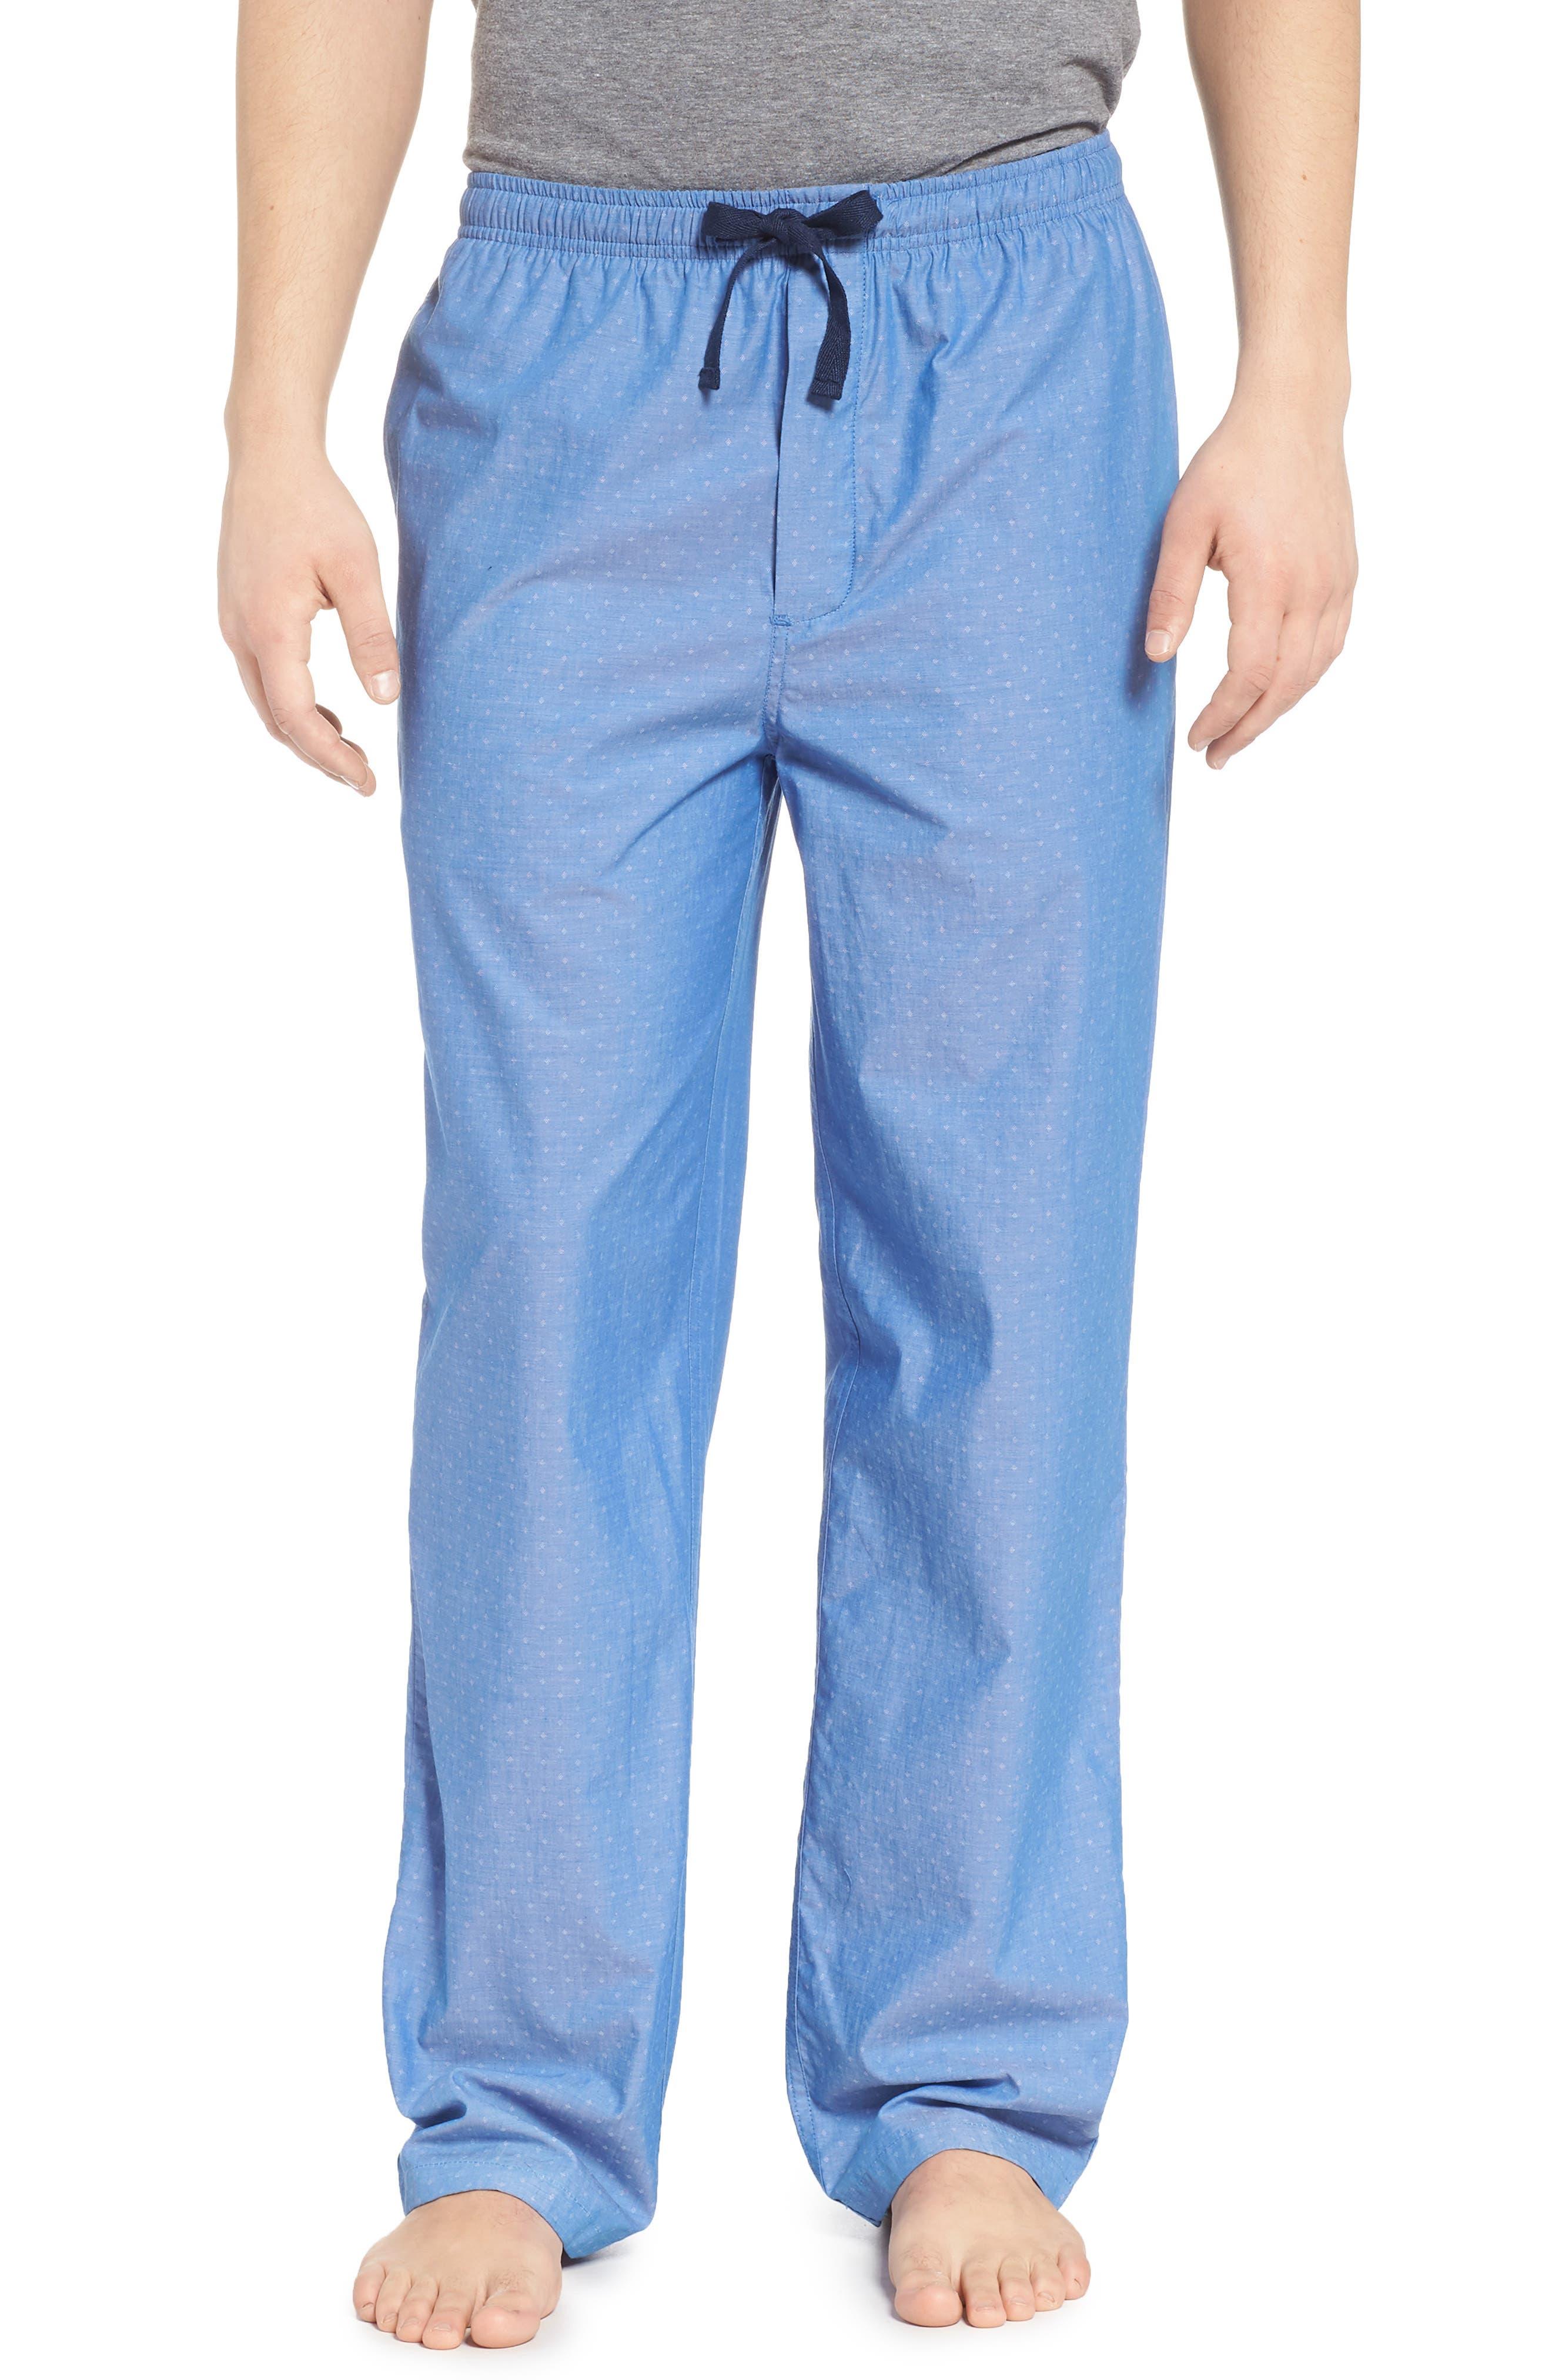 Poplin Lounge Pants,                         Main,                         color, Blue Bell Dobby Micro Dot